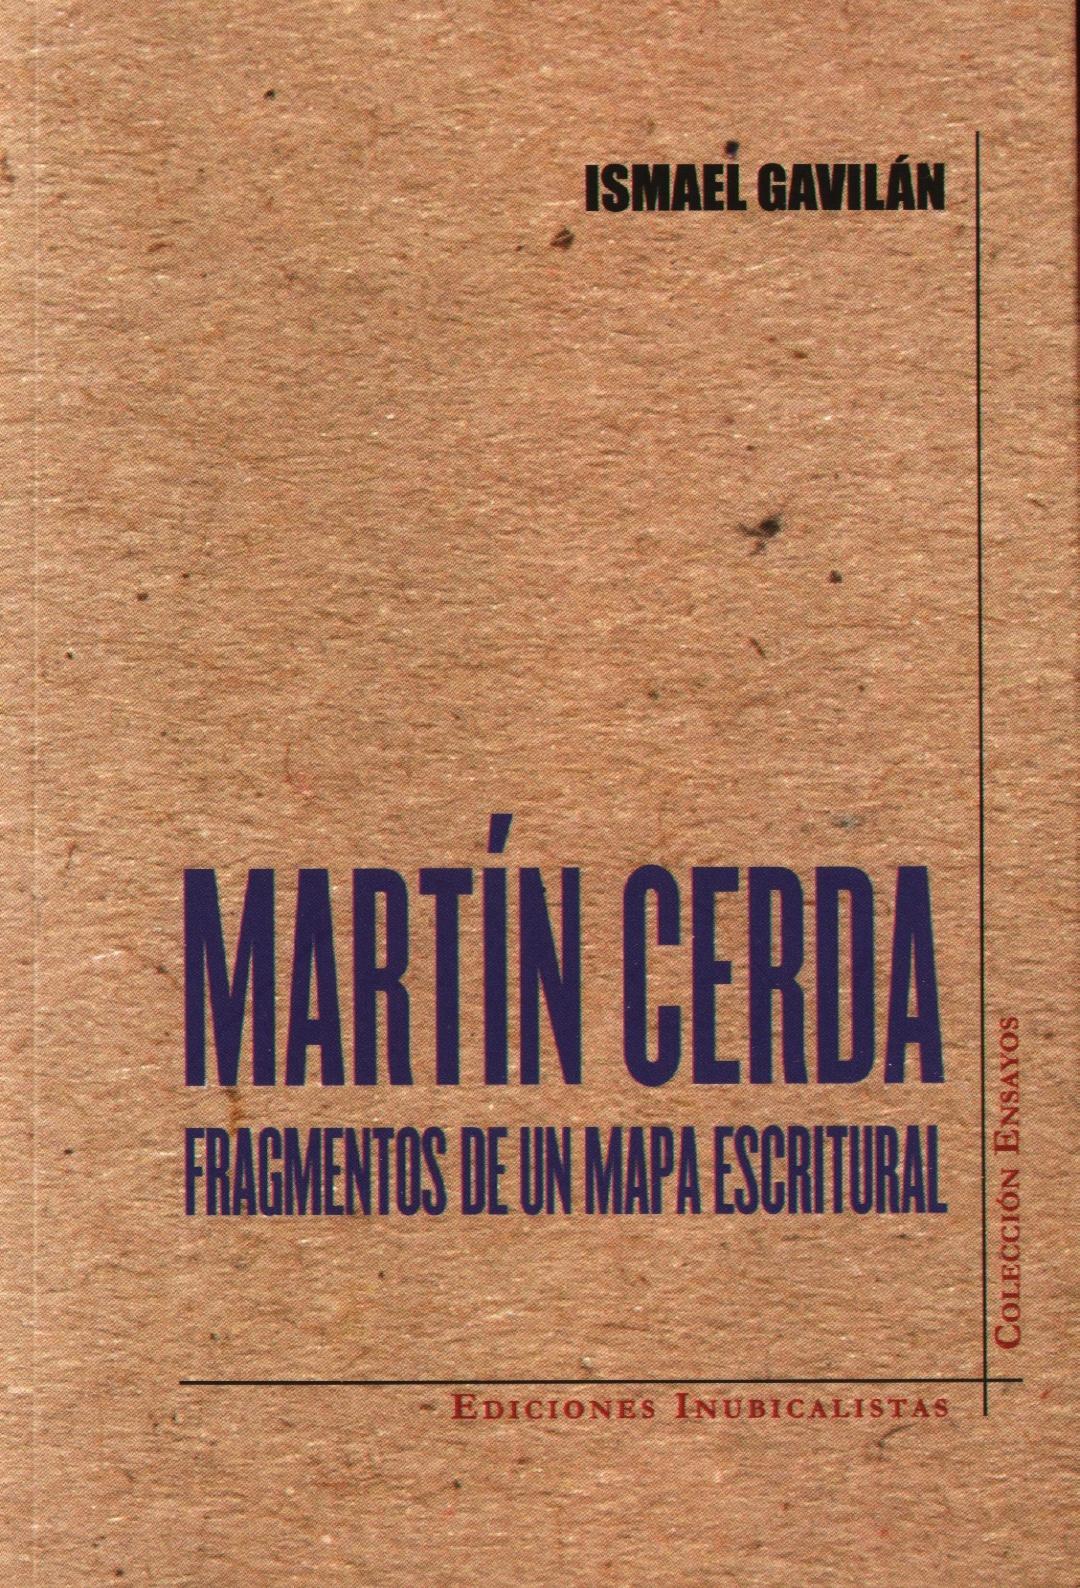 Martín Cerda